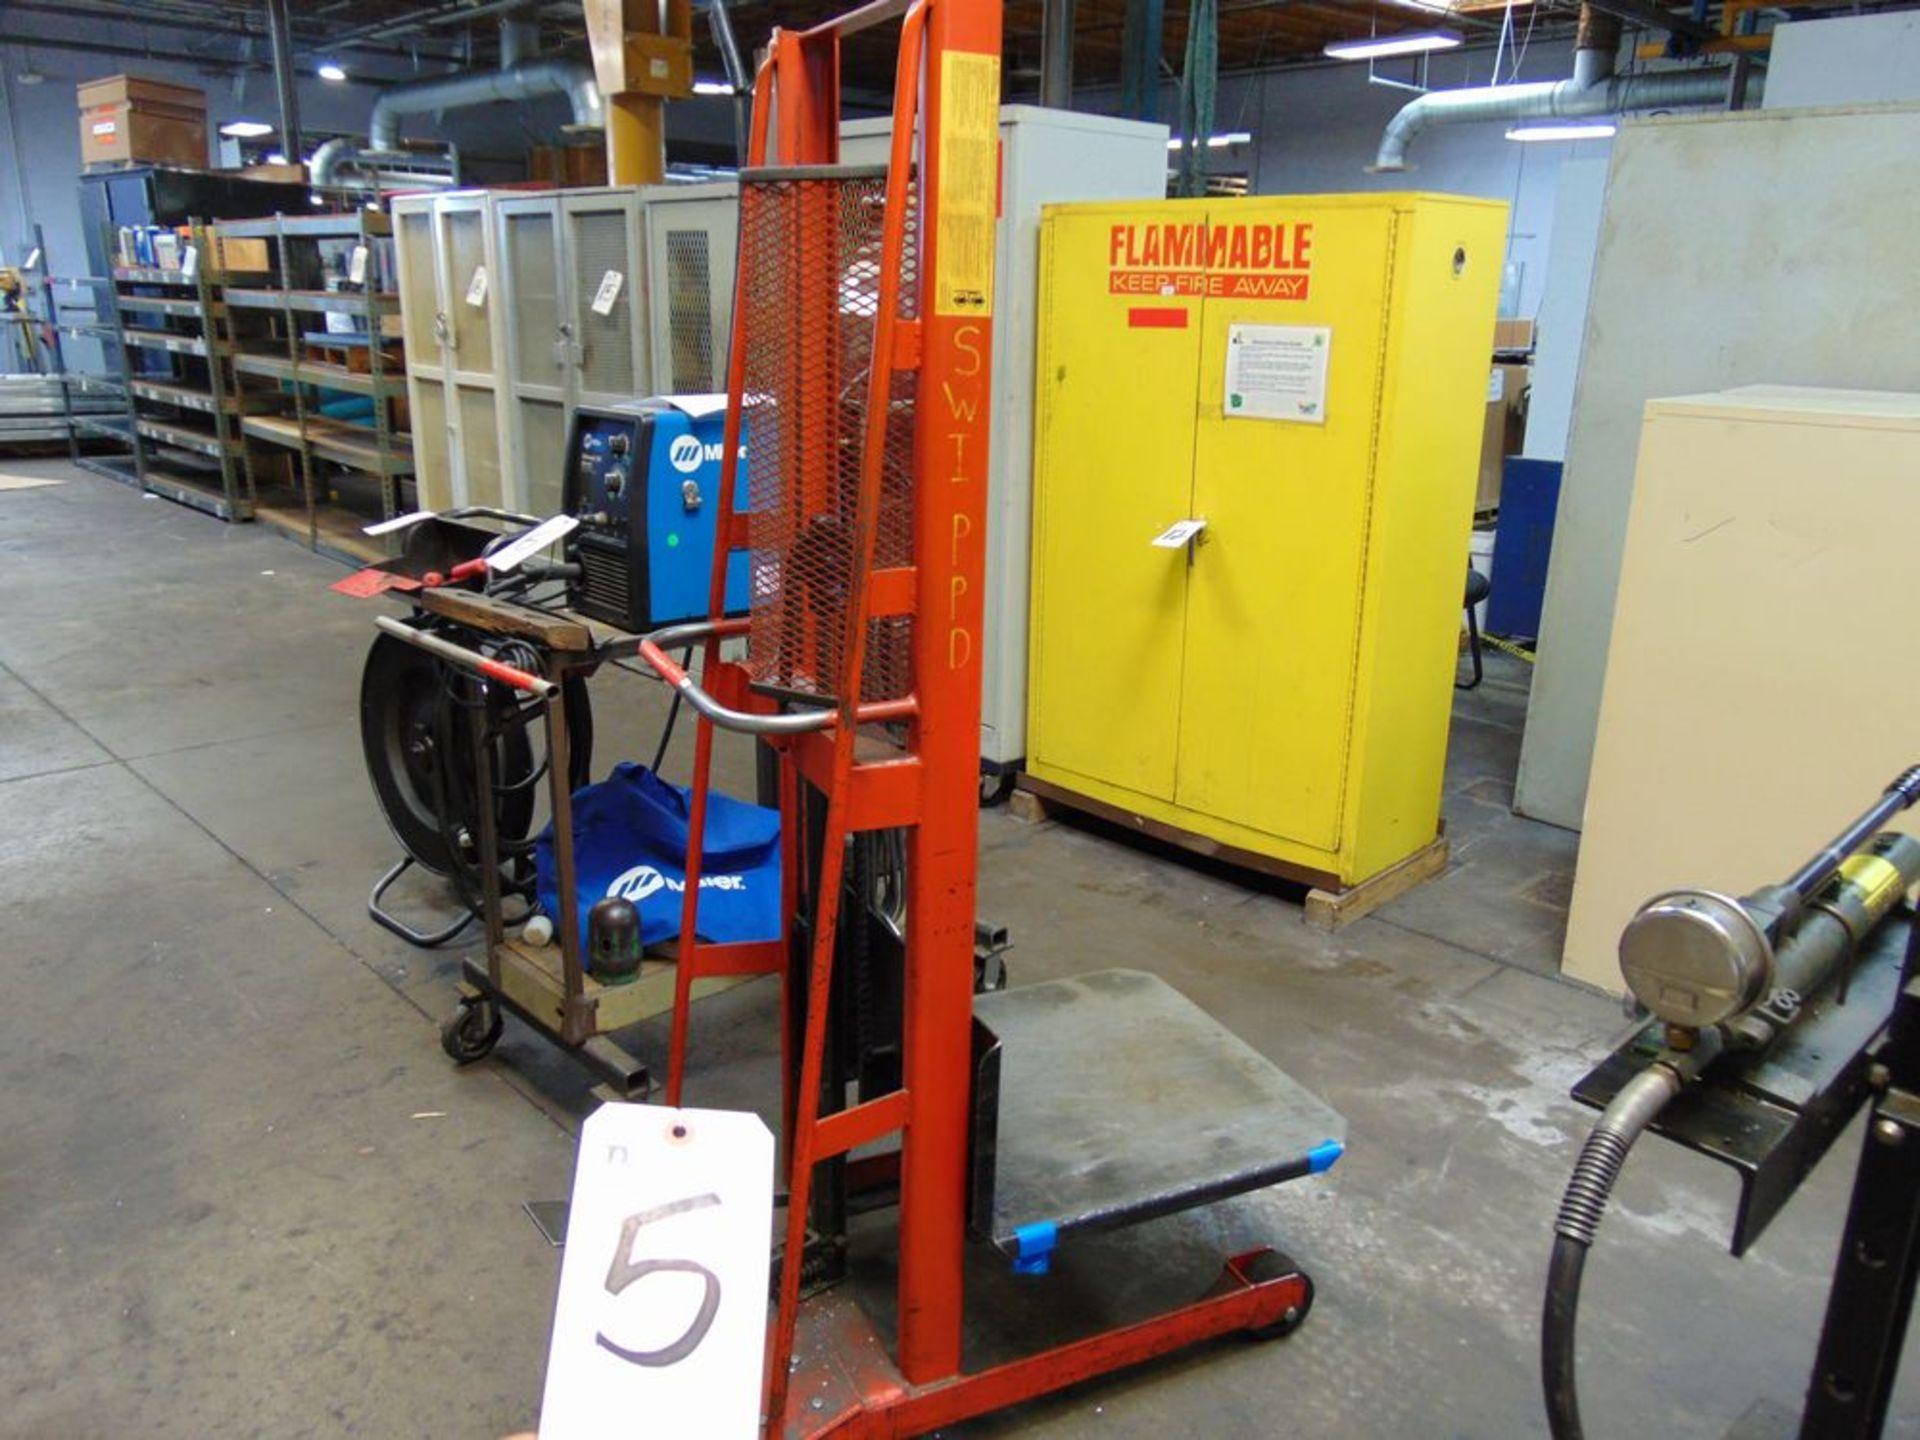 Lot 5 - Wesco 1000lb. Die Lift Cart